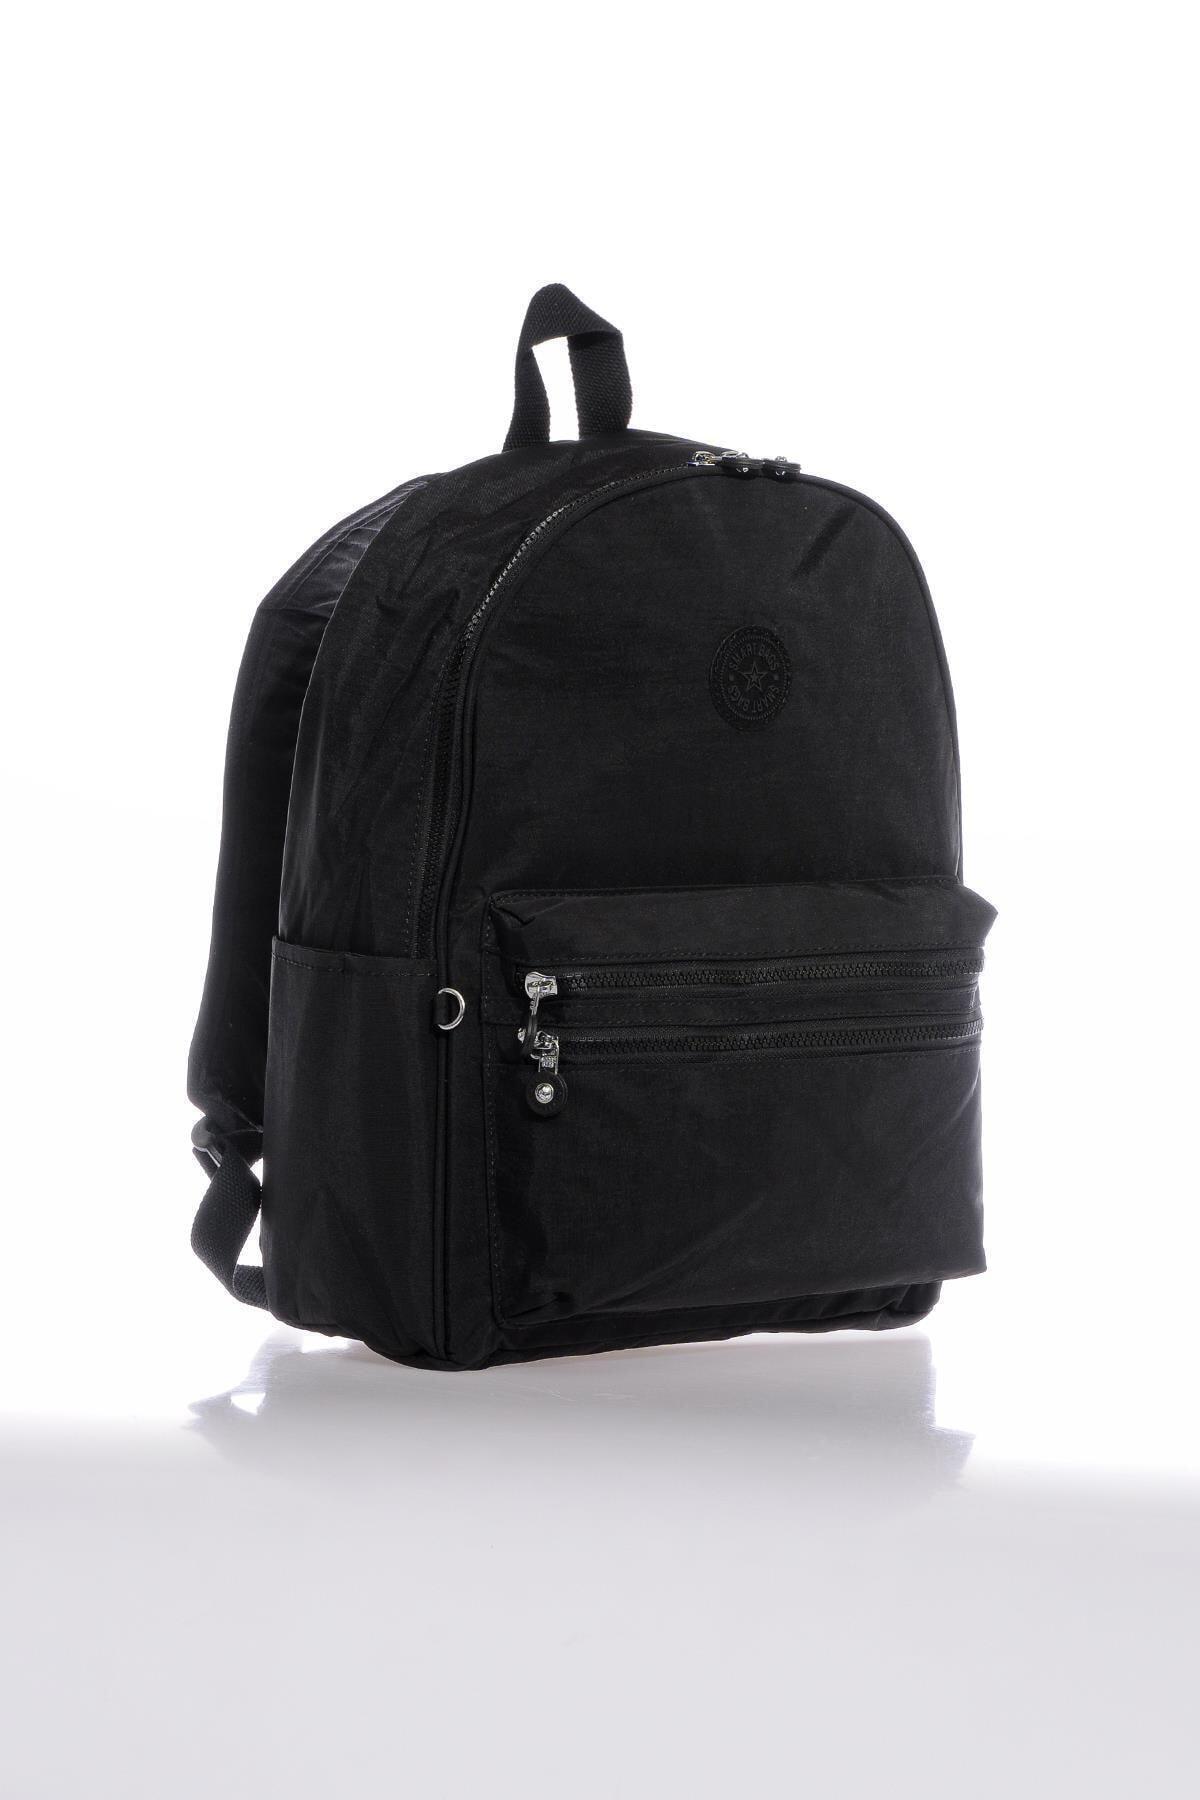 SMART BAGS Smb3078-0001 Siyah Kadın Sırt Çantası 2